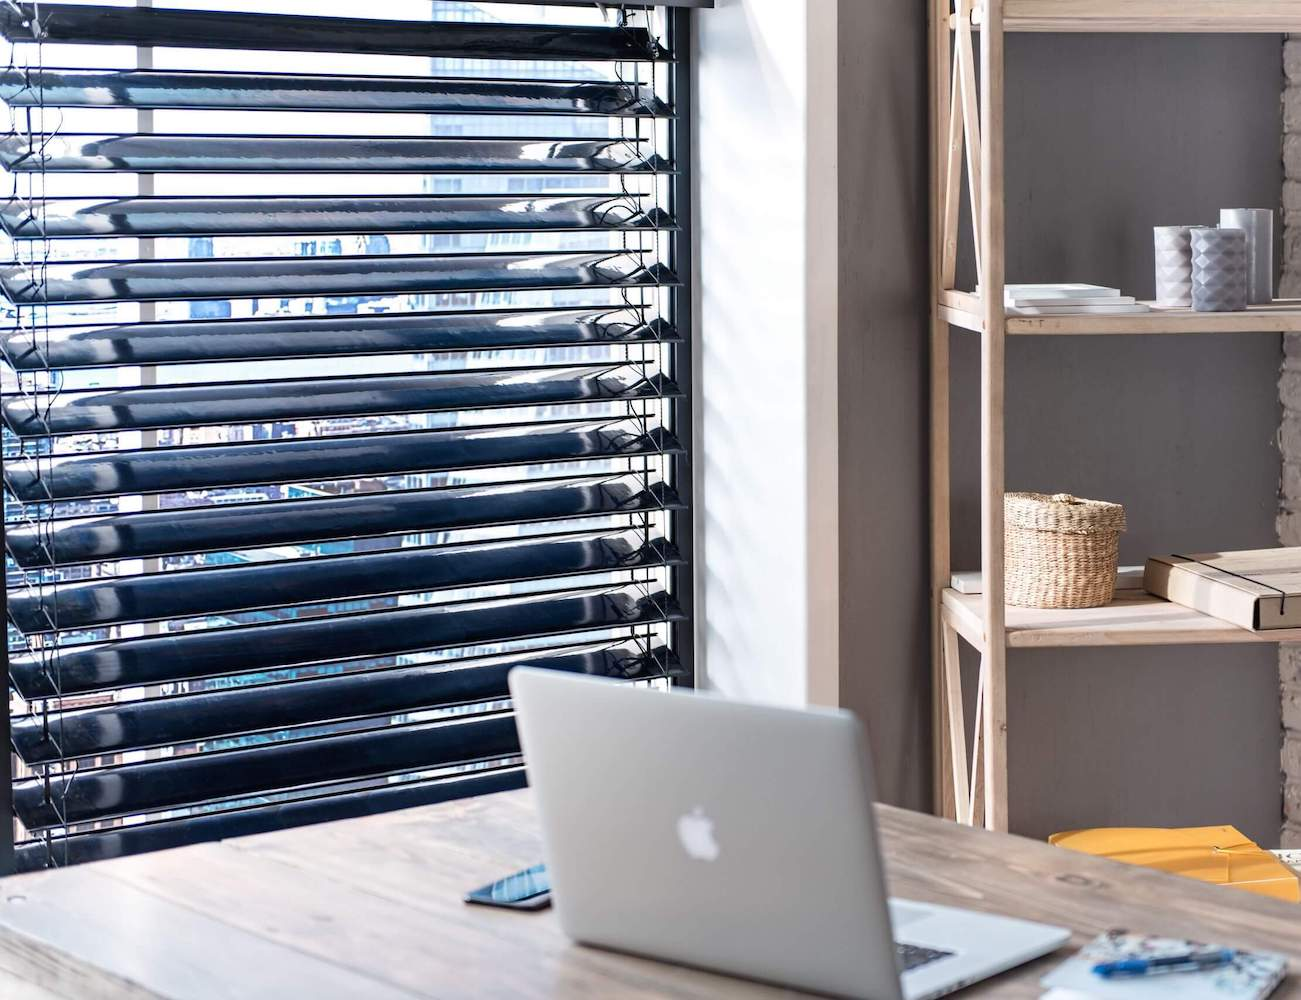 SolarGaps Smart Solar Blinds block sunshine while lowering your energy bill